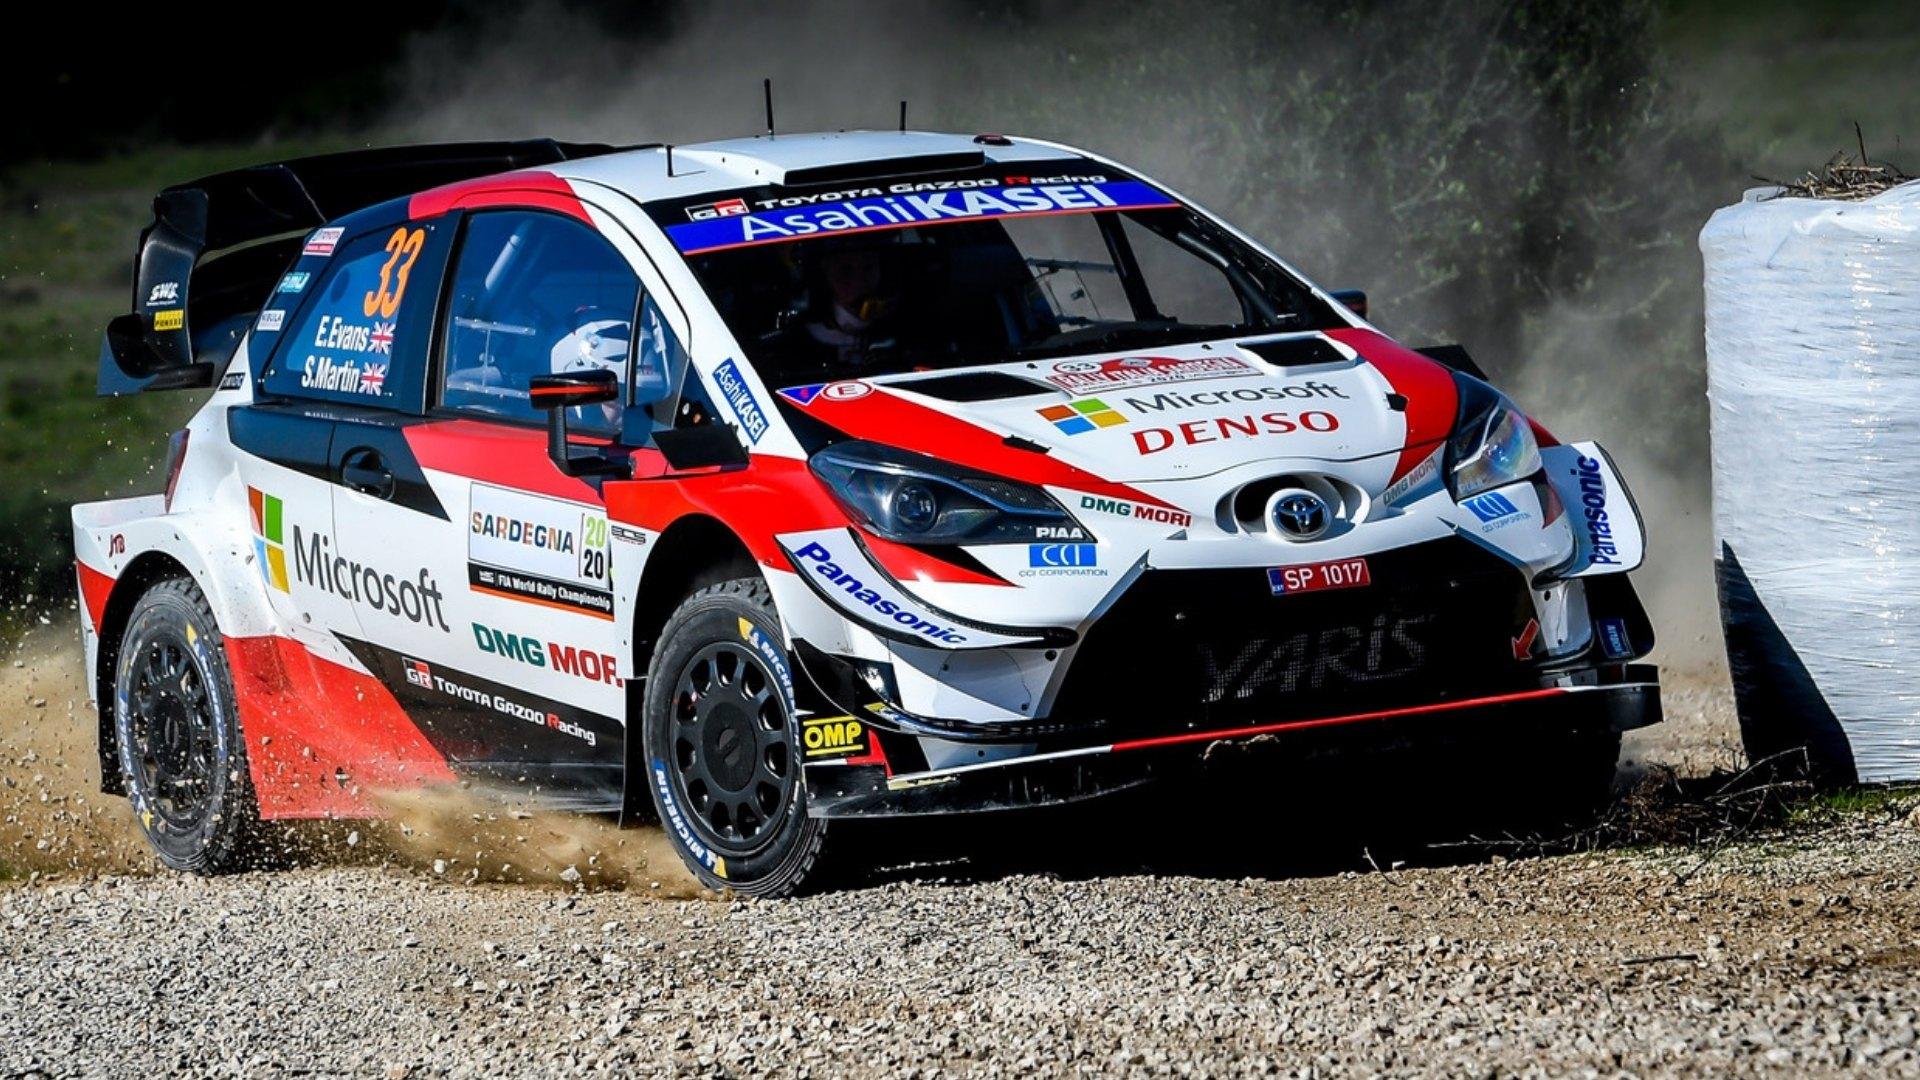 WRC: Rally d' Italia - Sardegna [8-10 Octubre] - Página 2 08102_Evans_Shakedown